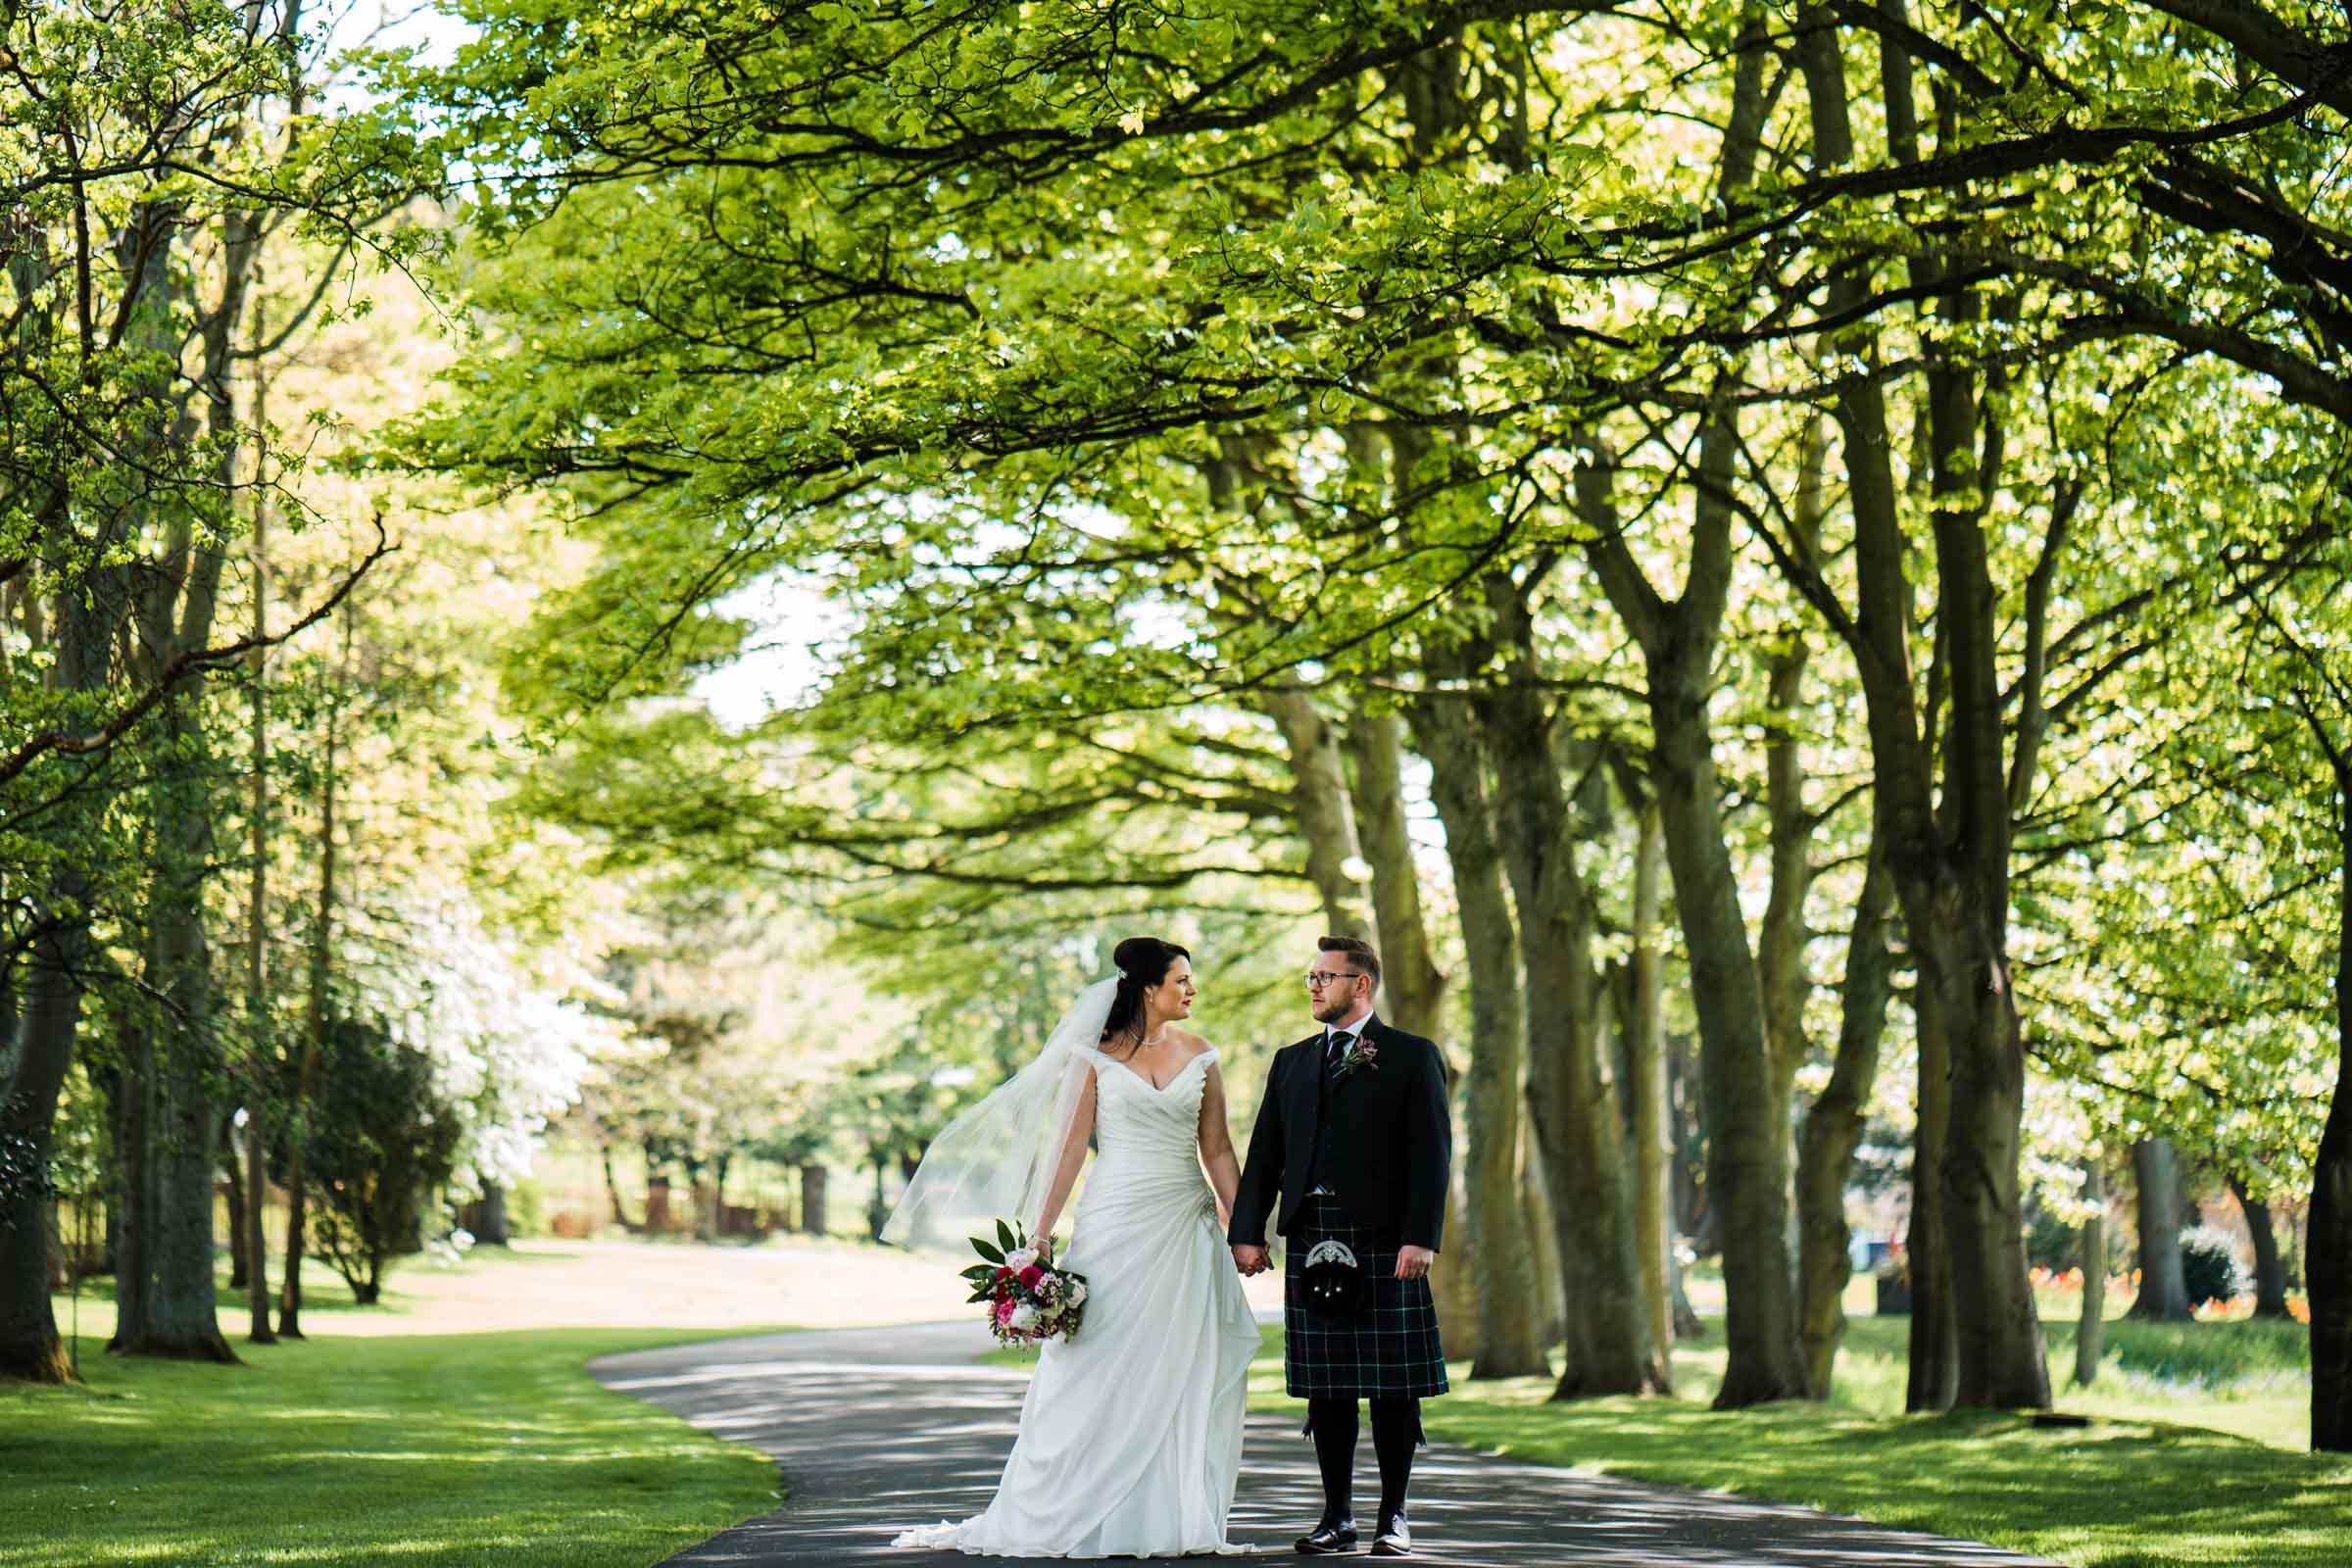 western-house-hotel-ayrshire-wedding-dearlyphotography (18 of 19).jpg